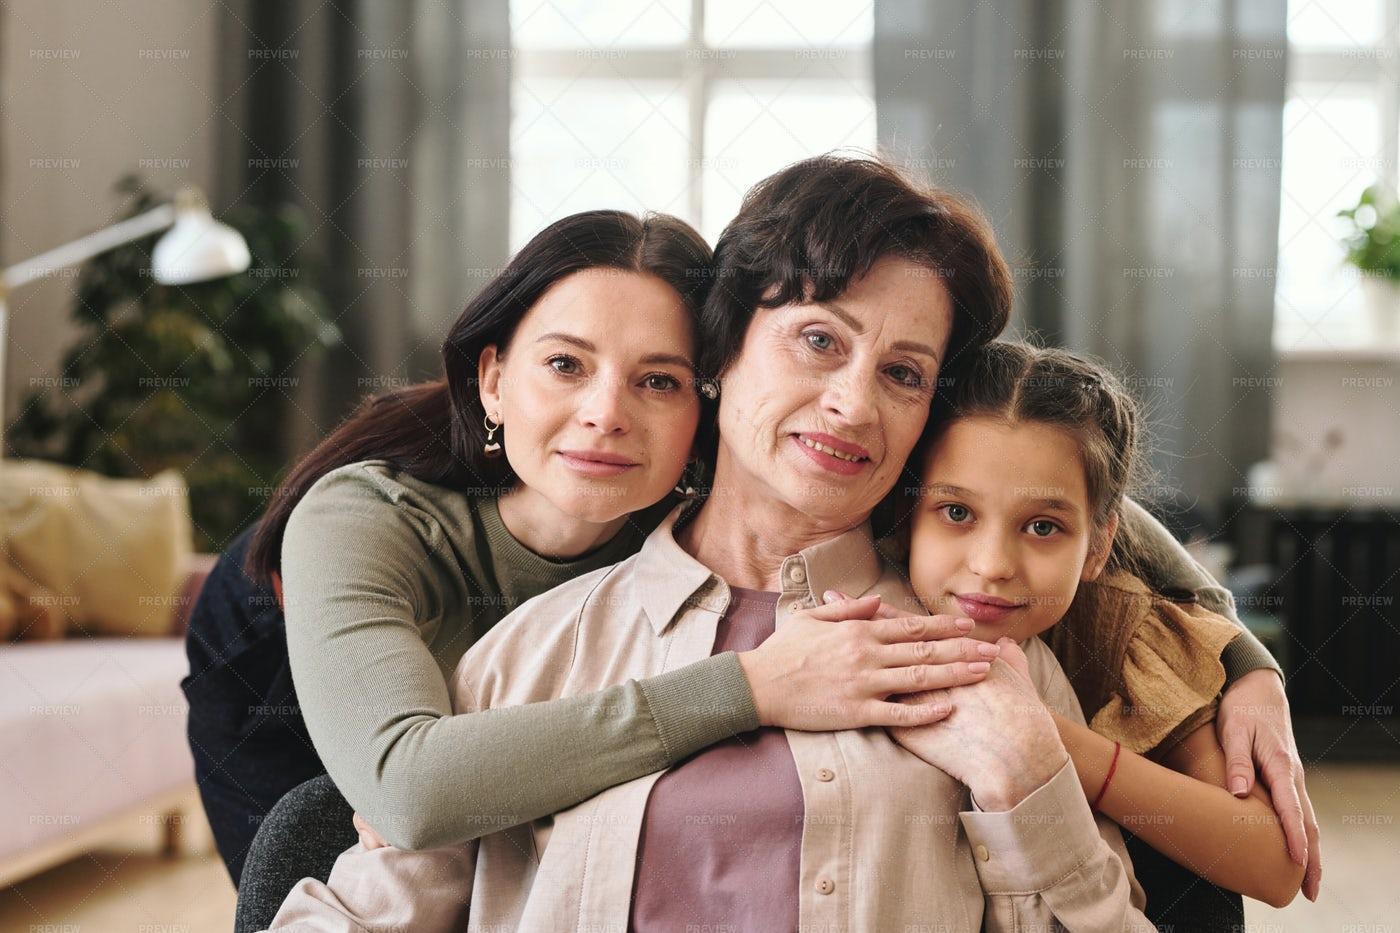 Women Of Three Generations Hugging: Stock Photos